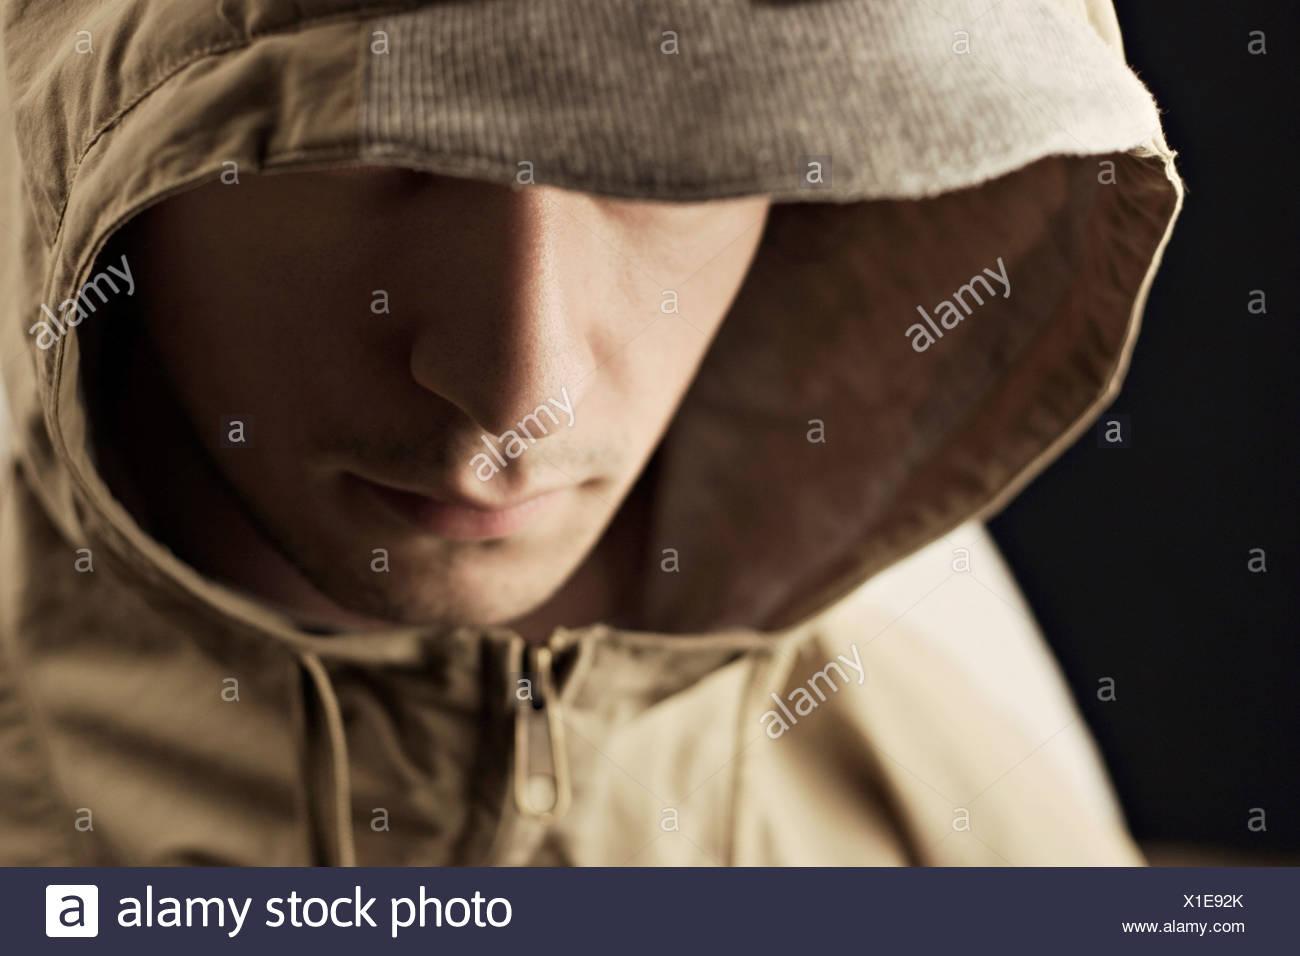 Junger Mann mit Kapuze Jacke, close-up Stockbild